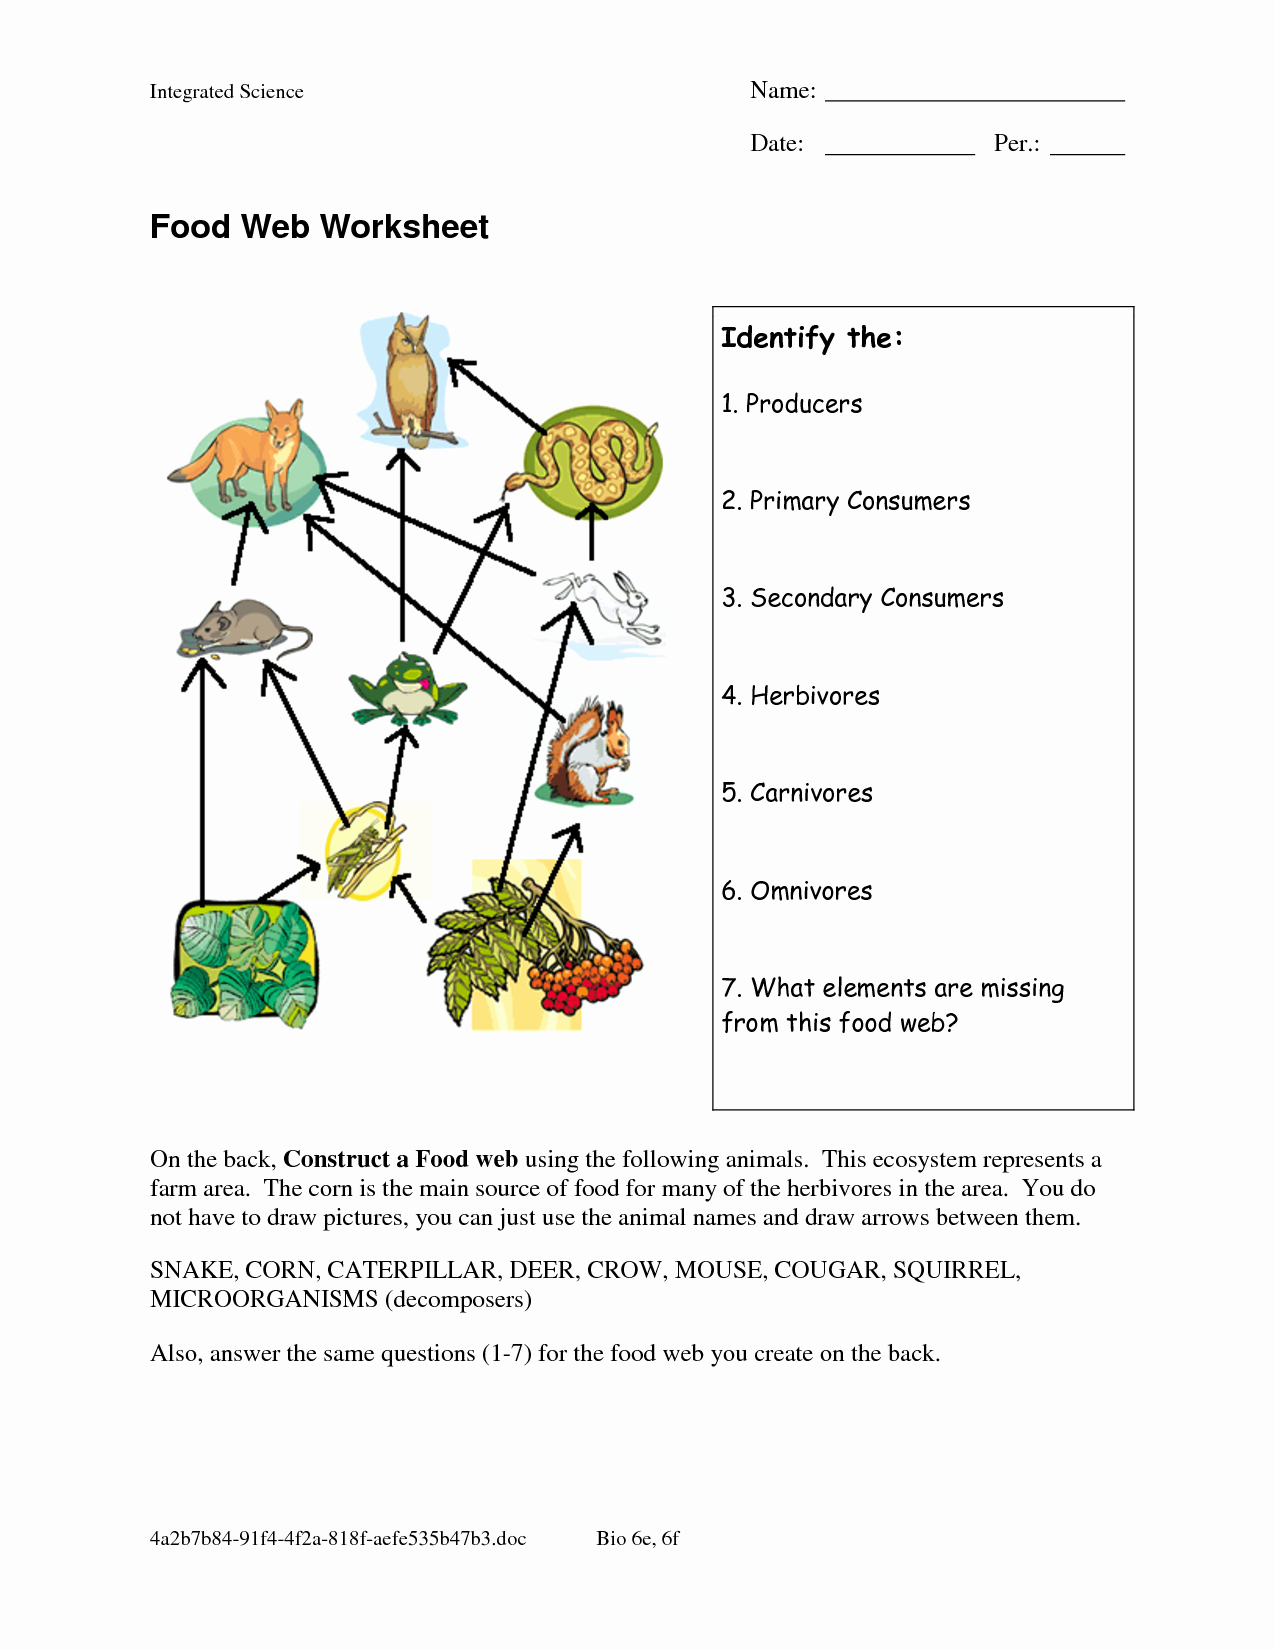 Food Web Worksheet Answer Key Luxury Food Web Worksheets